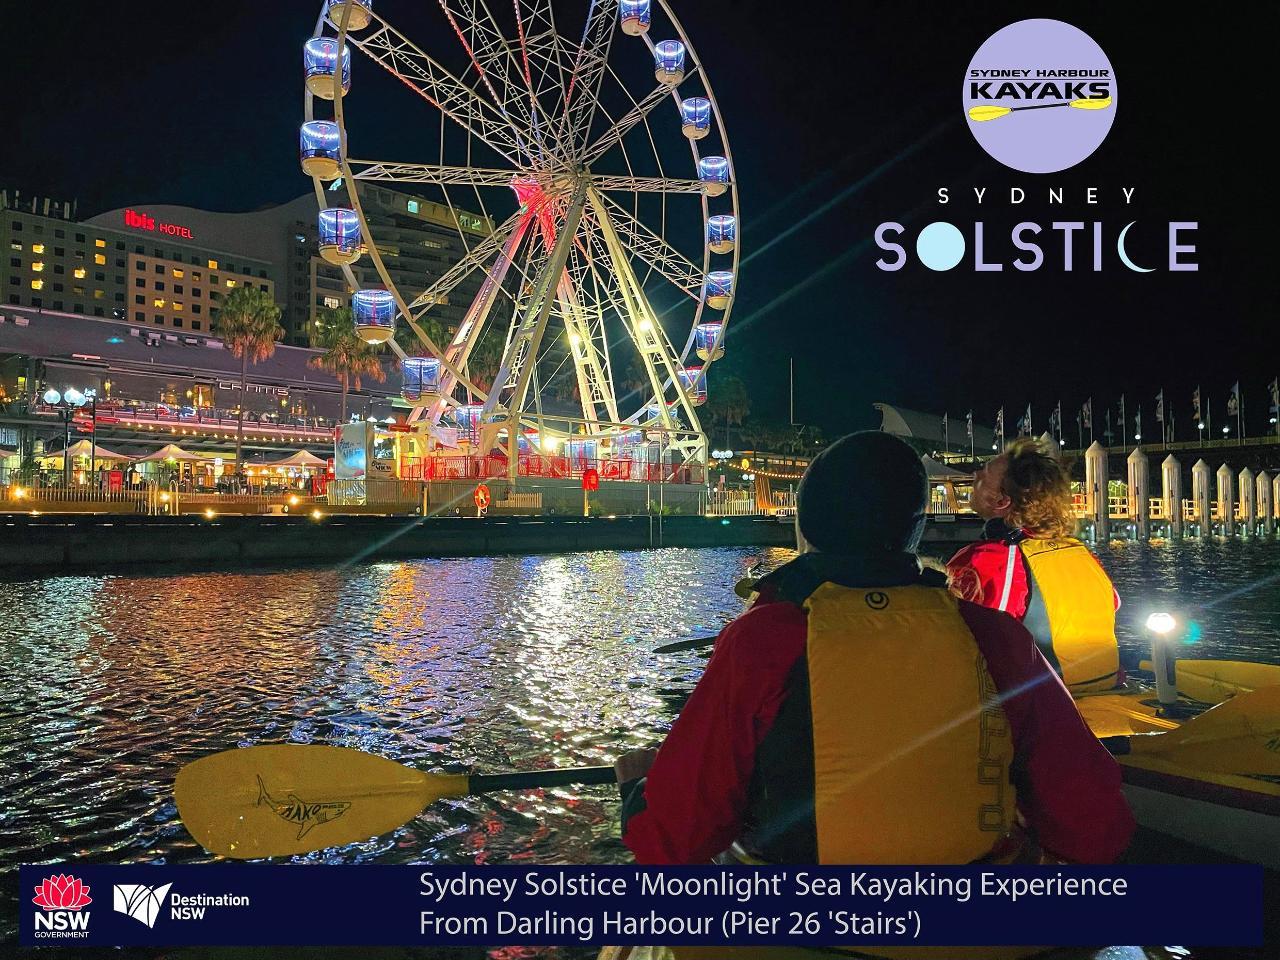 Sydney Solstice 'Moonlight' Sea Kayaking Experience (Darling Harbour, Sydney)